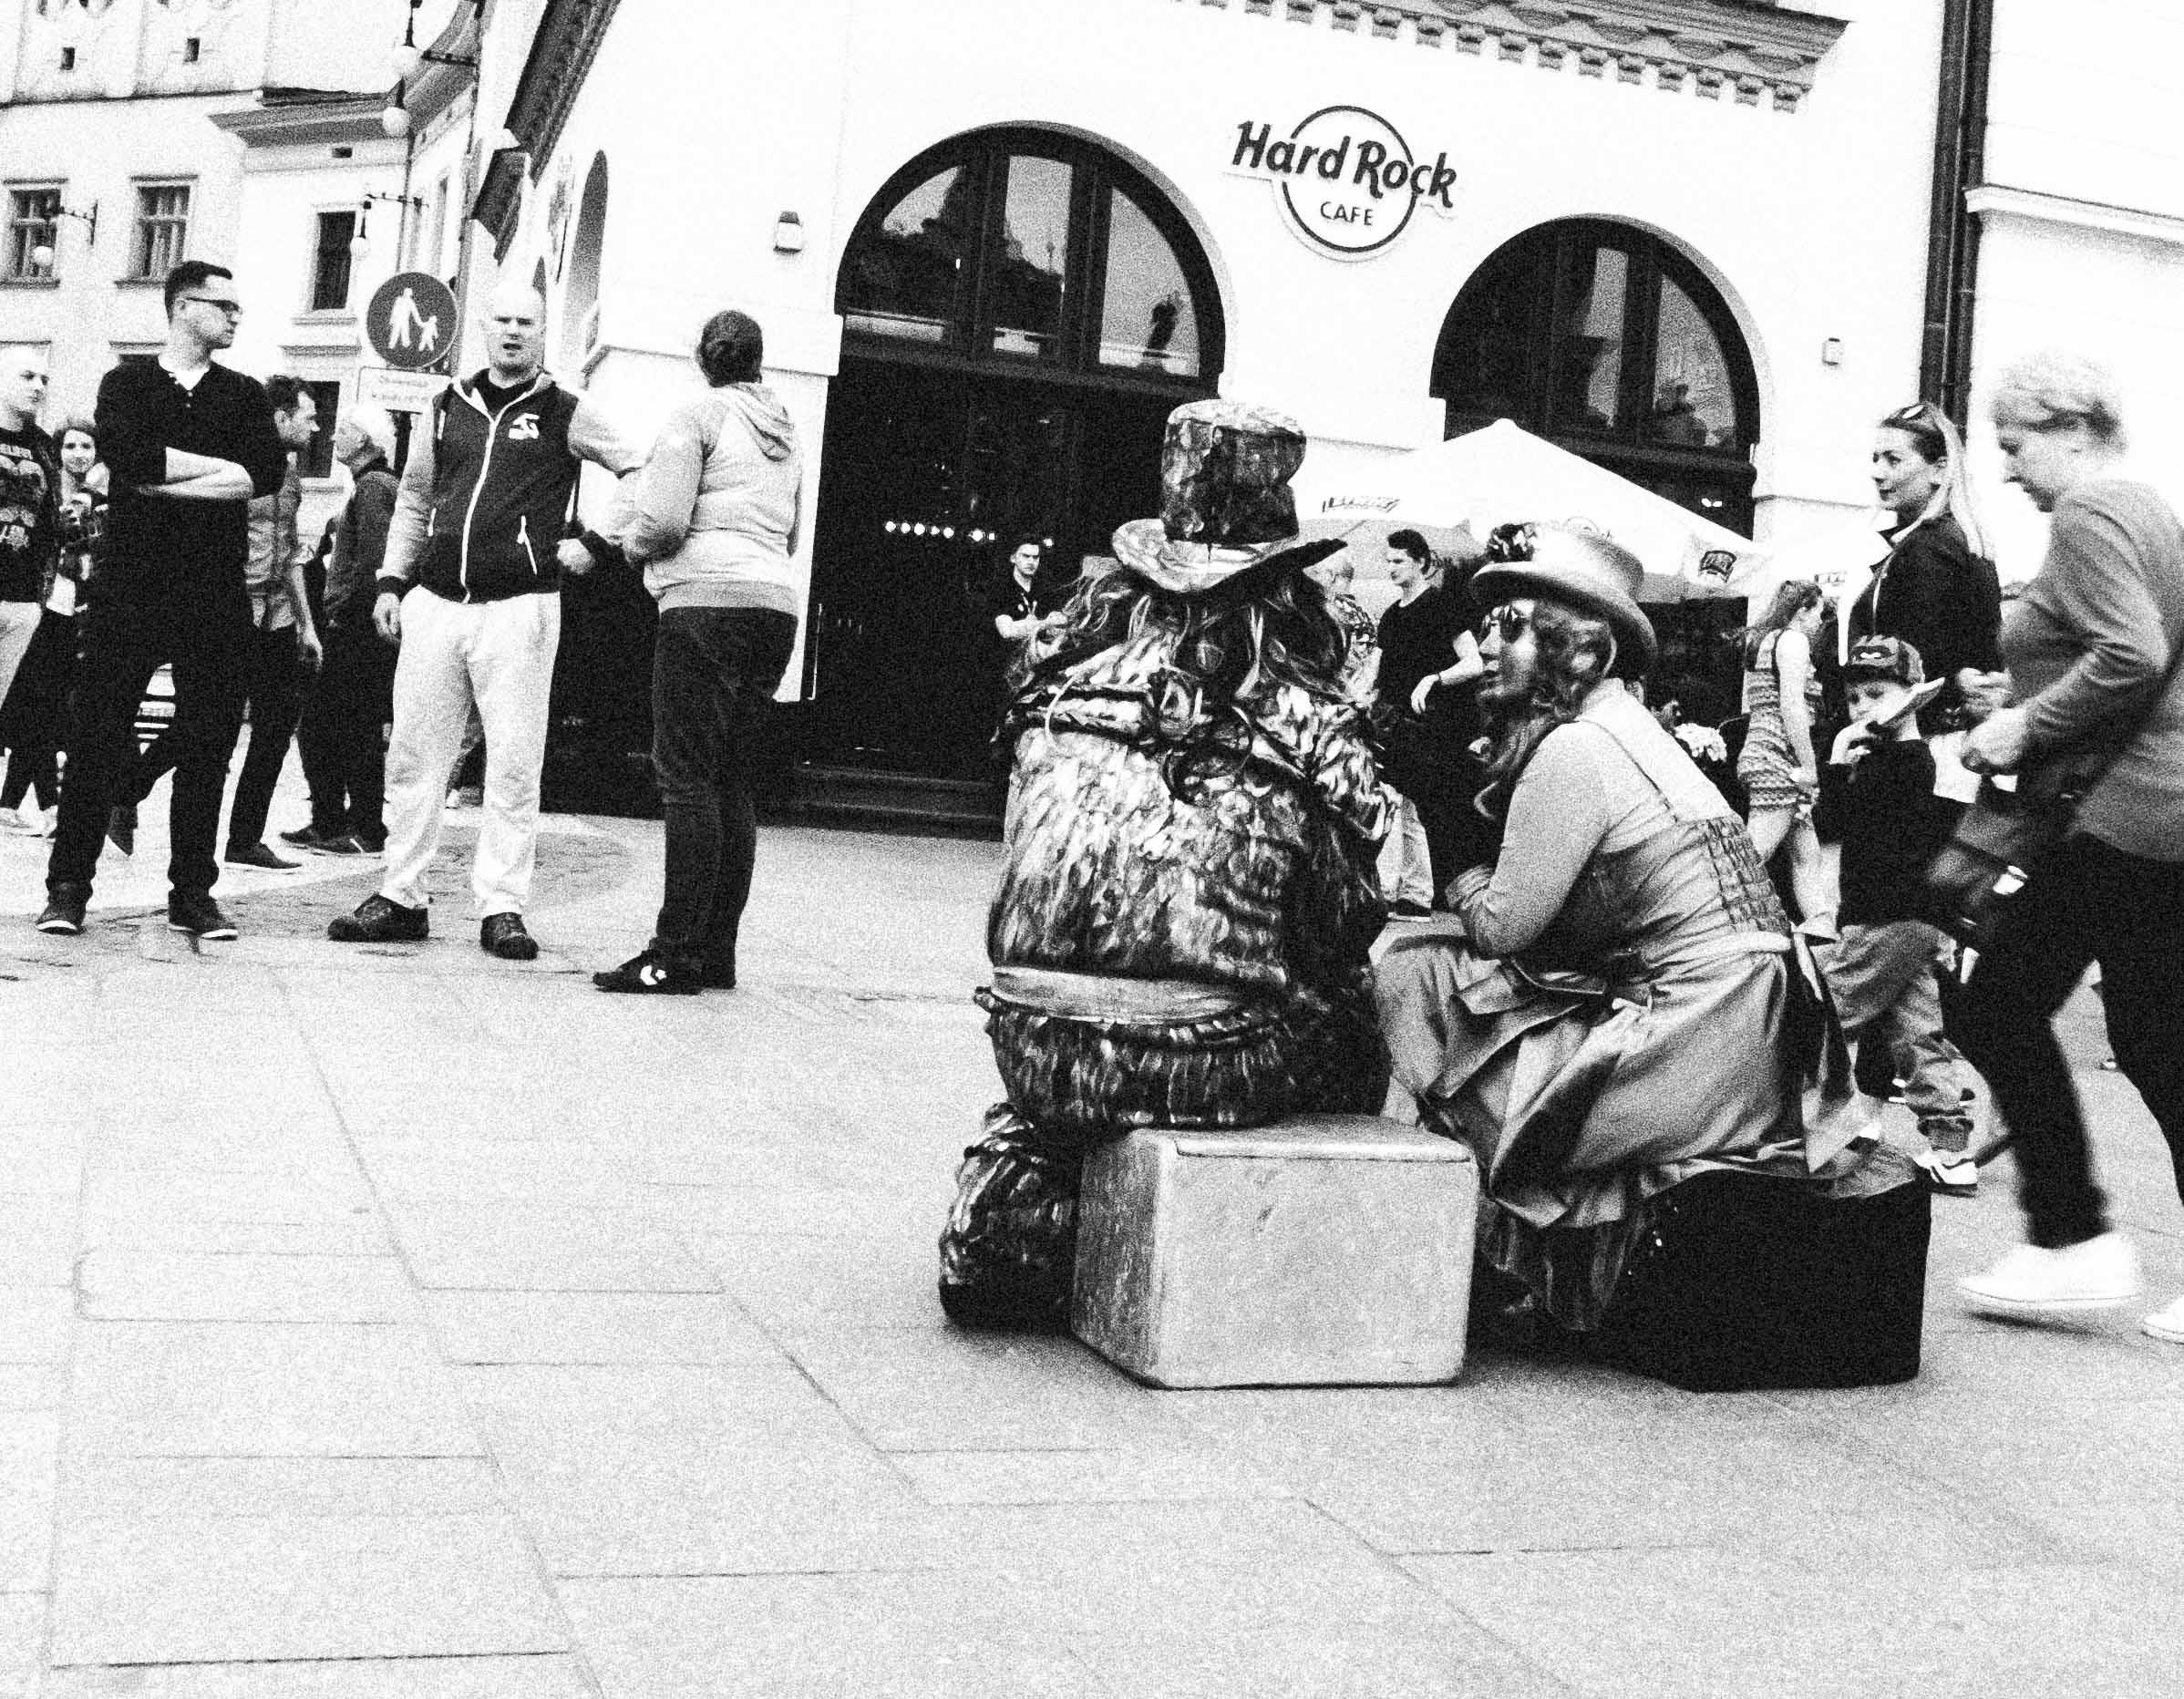 Strassenkunst am Rynek in Krakau